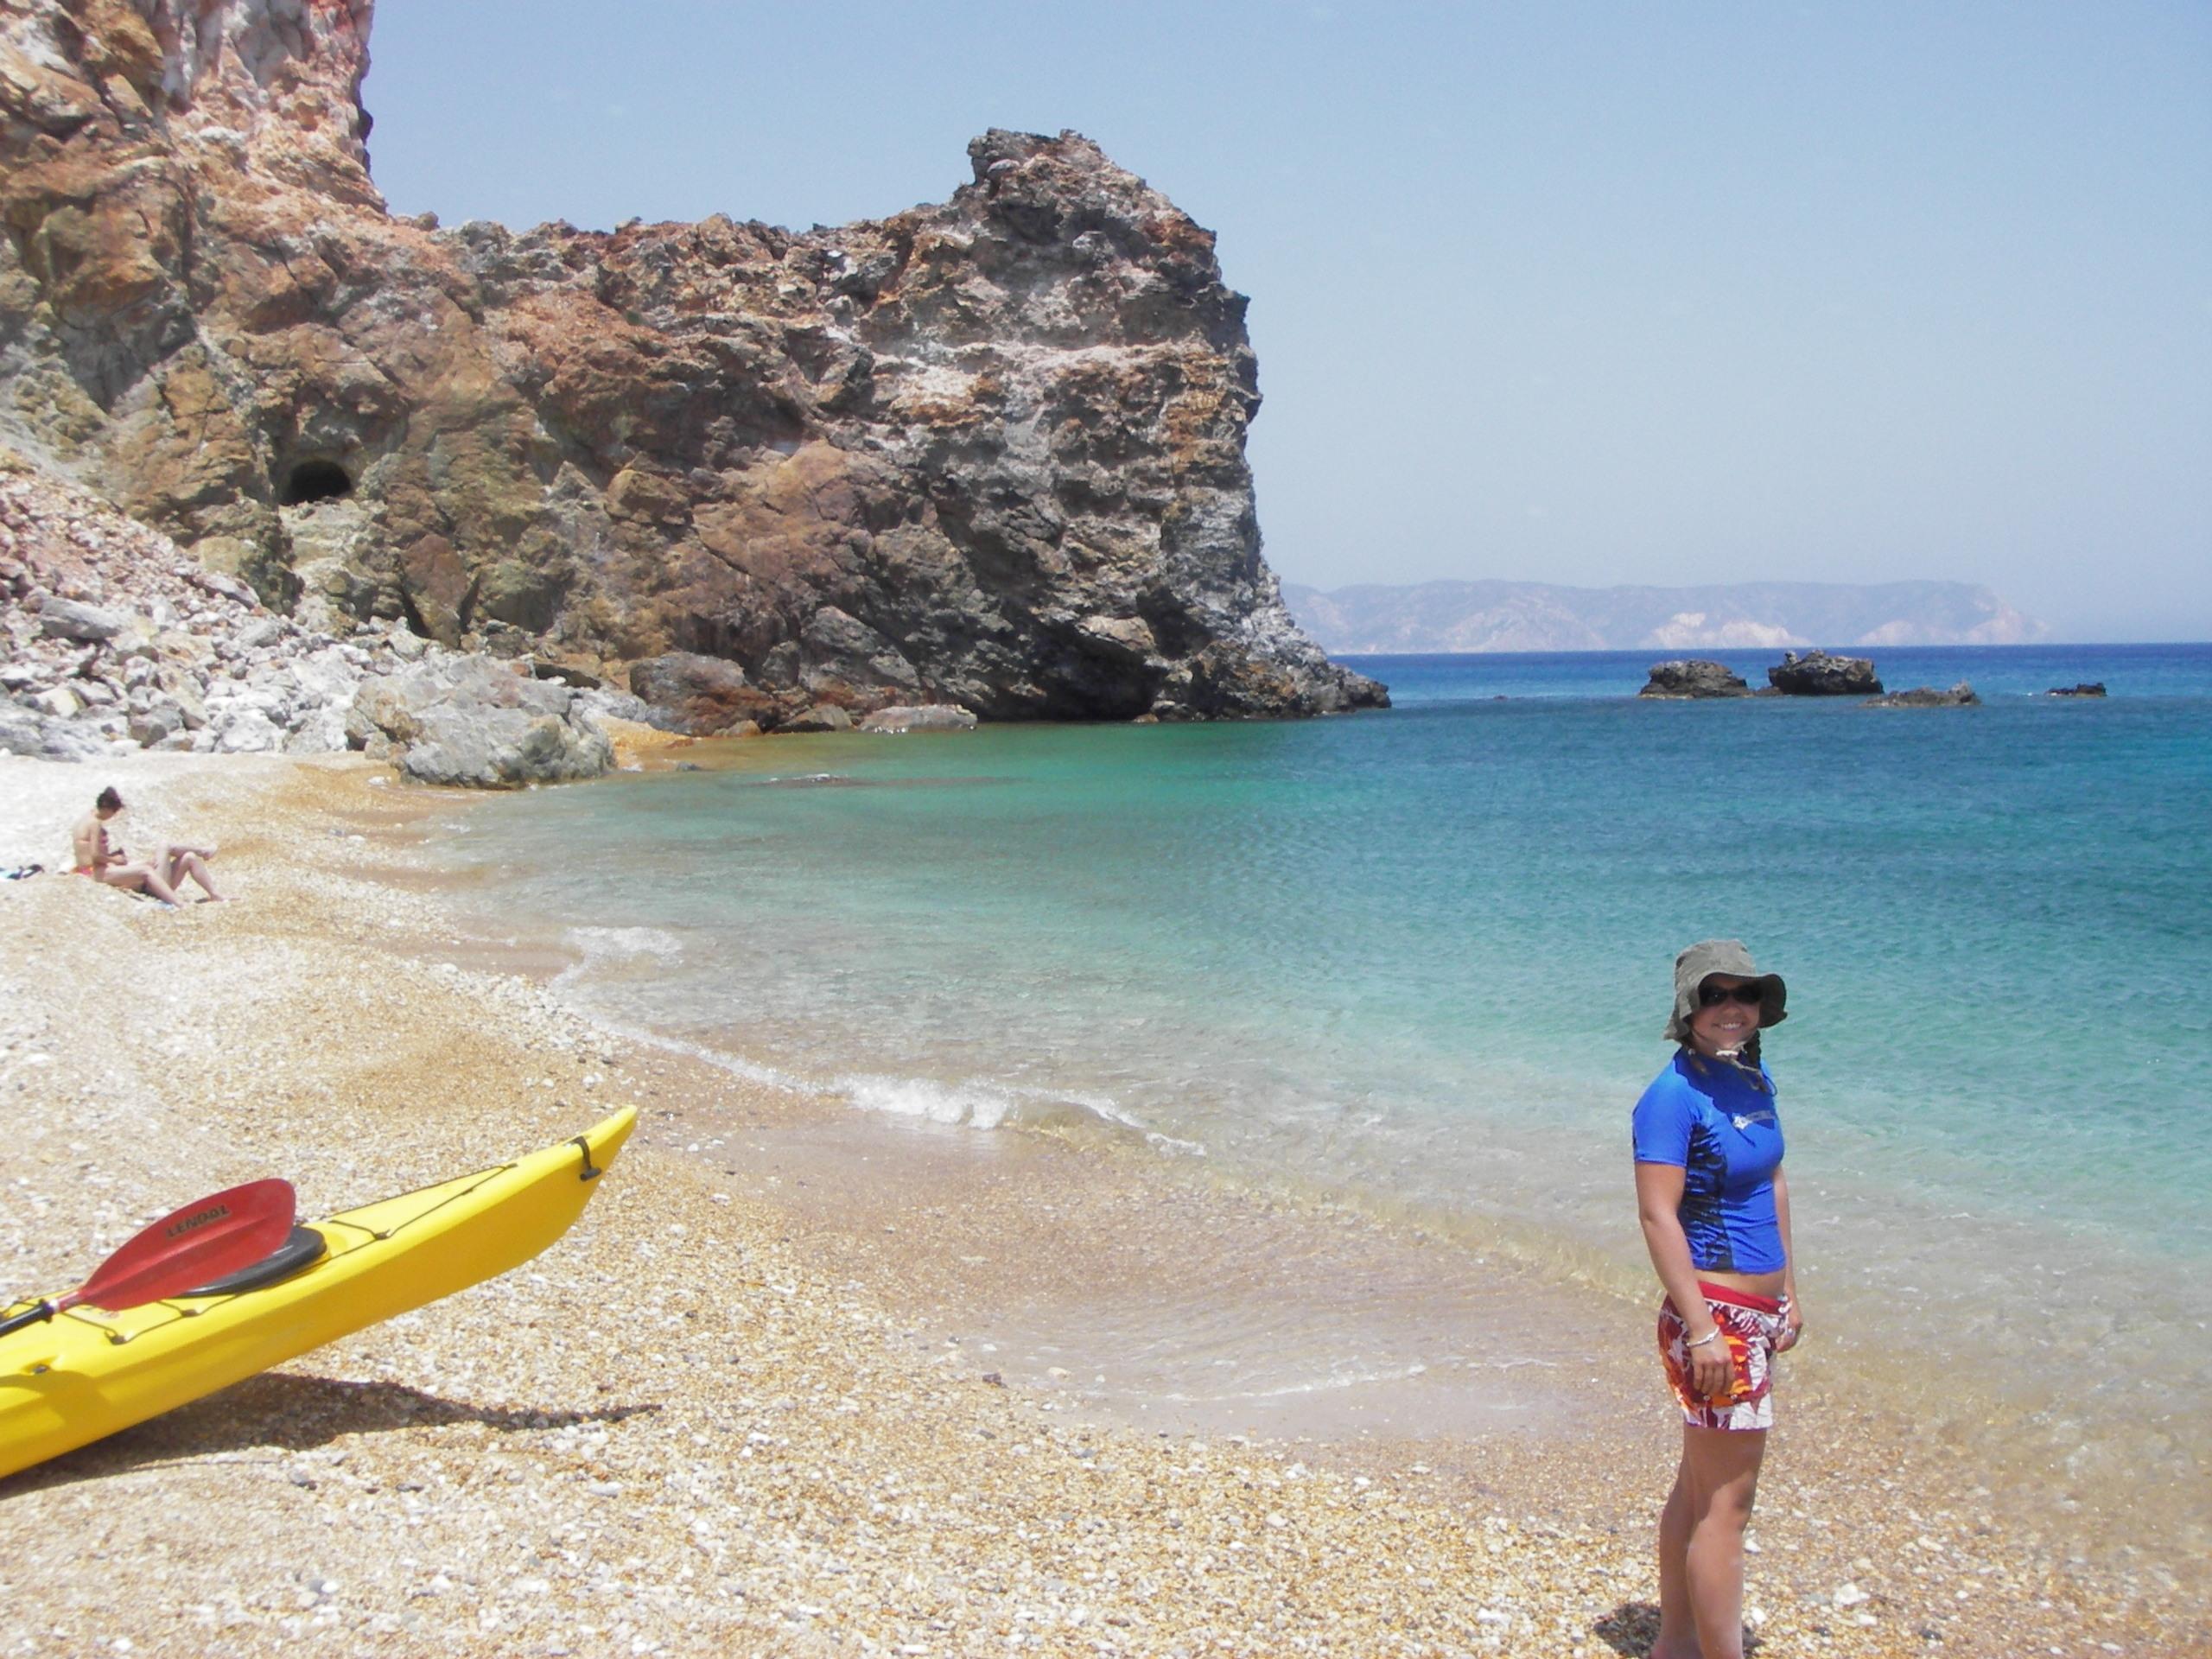 Sea_Kayaking_in_Greece